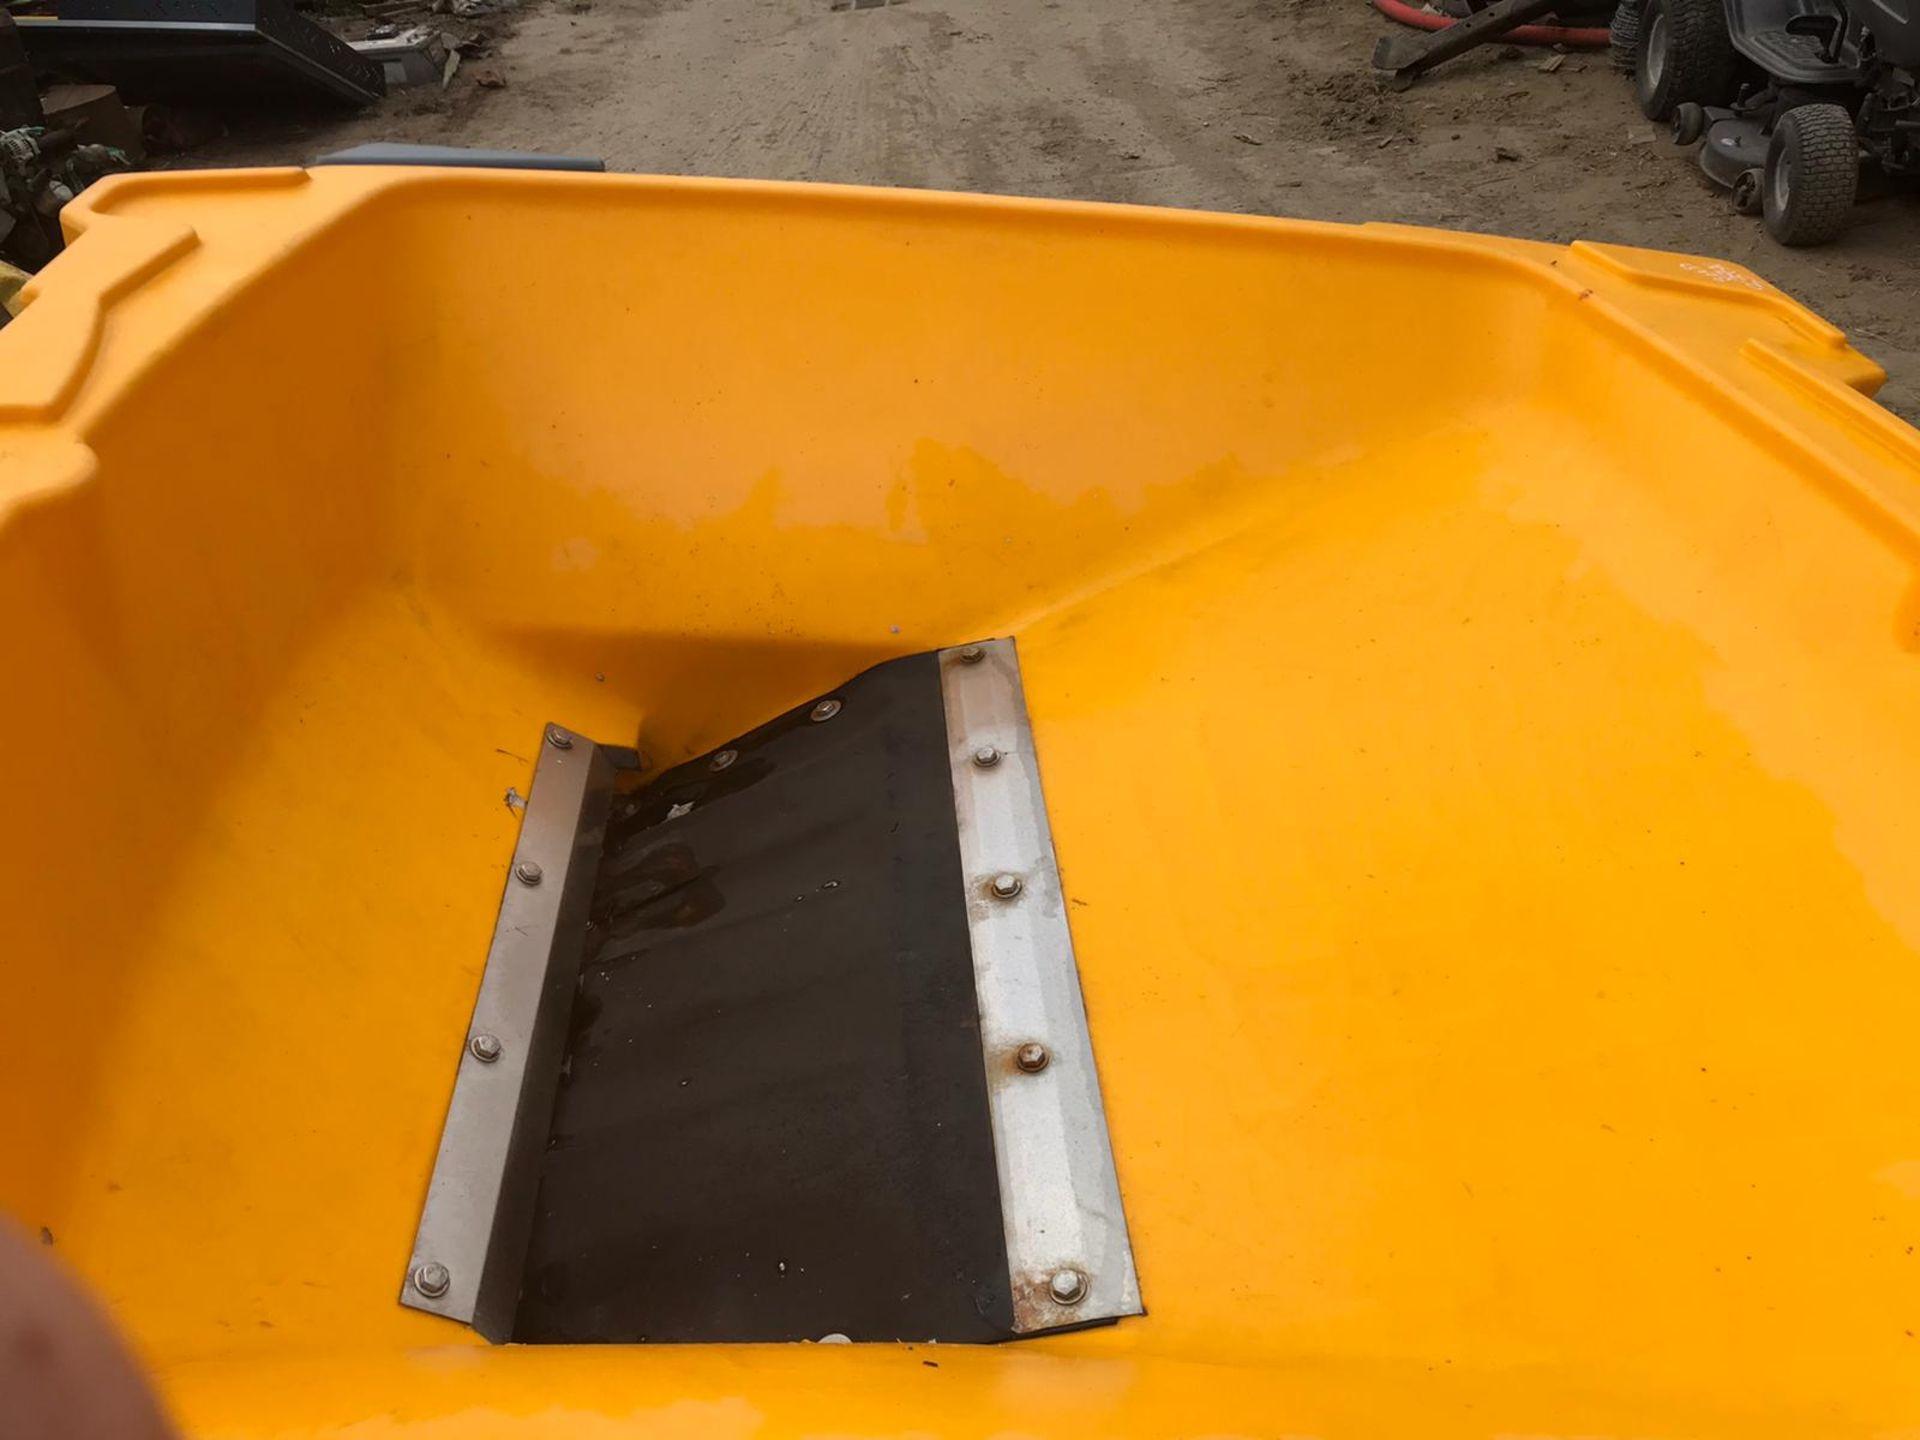 Lot 17 - CRUISER TURBOCAST 1000 TOW BEHIND SALT SPREADER, WORKS, *PLUS VAT*